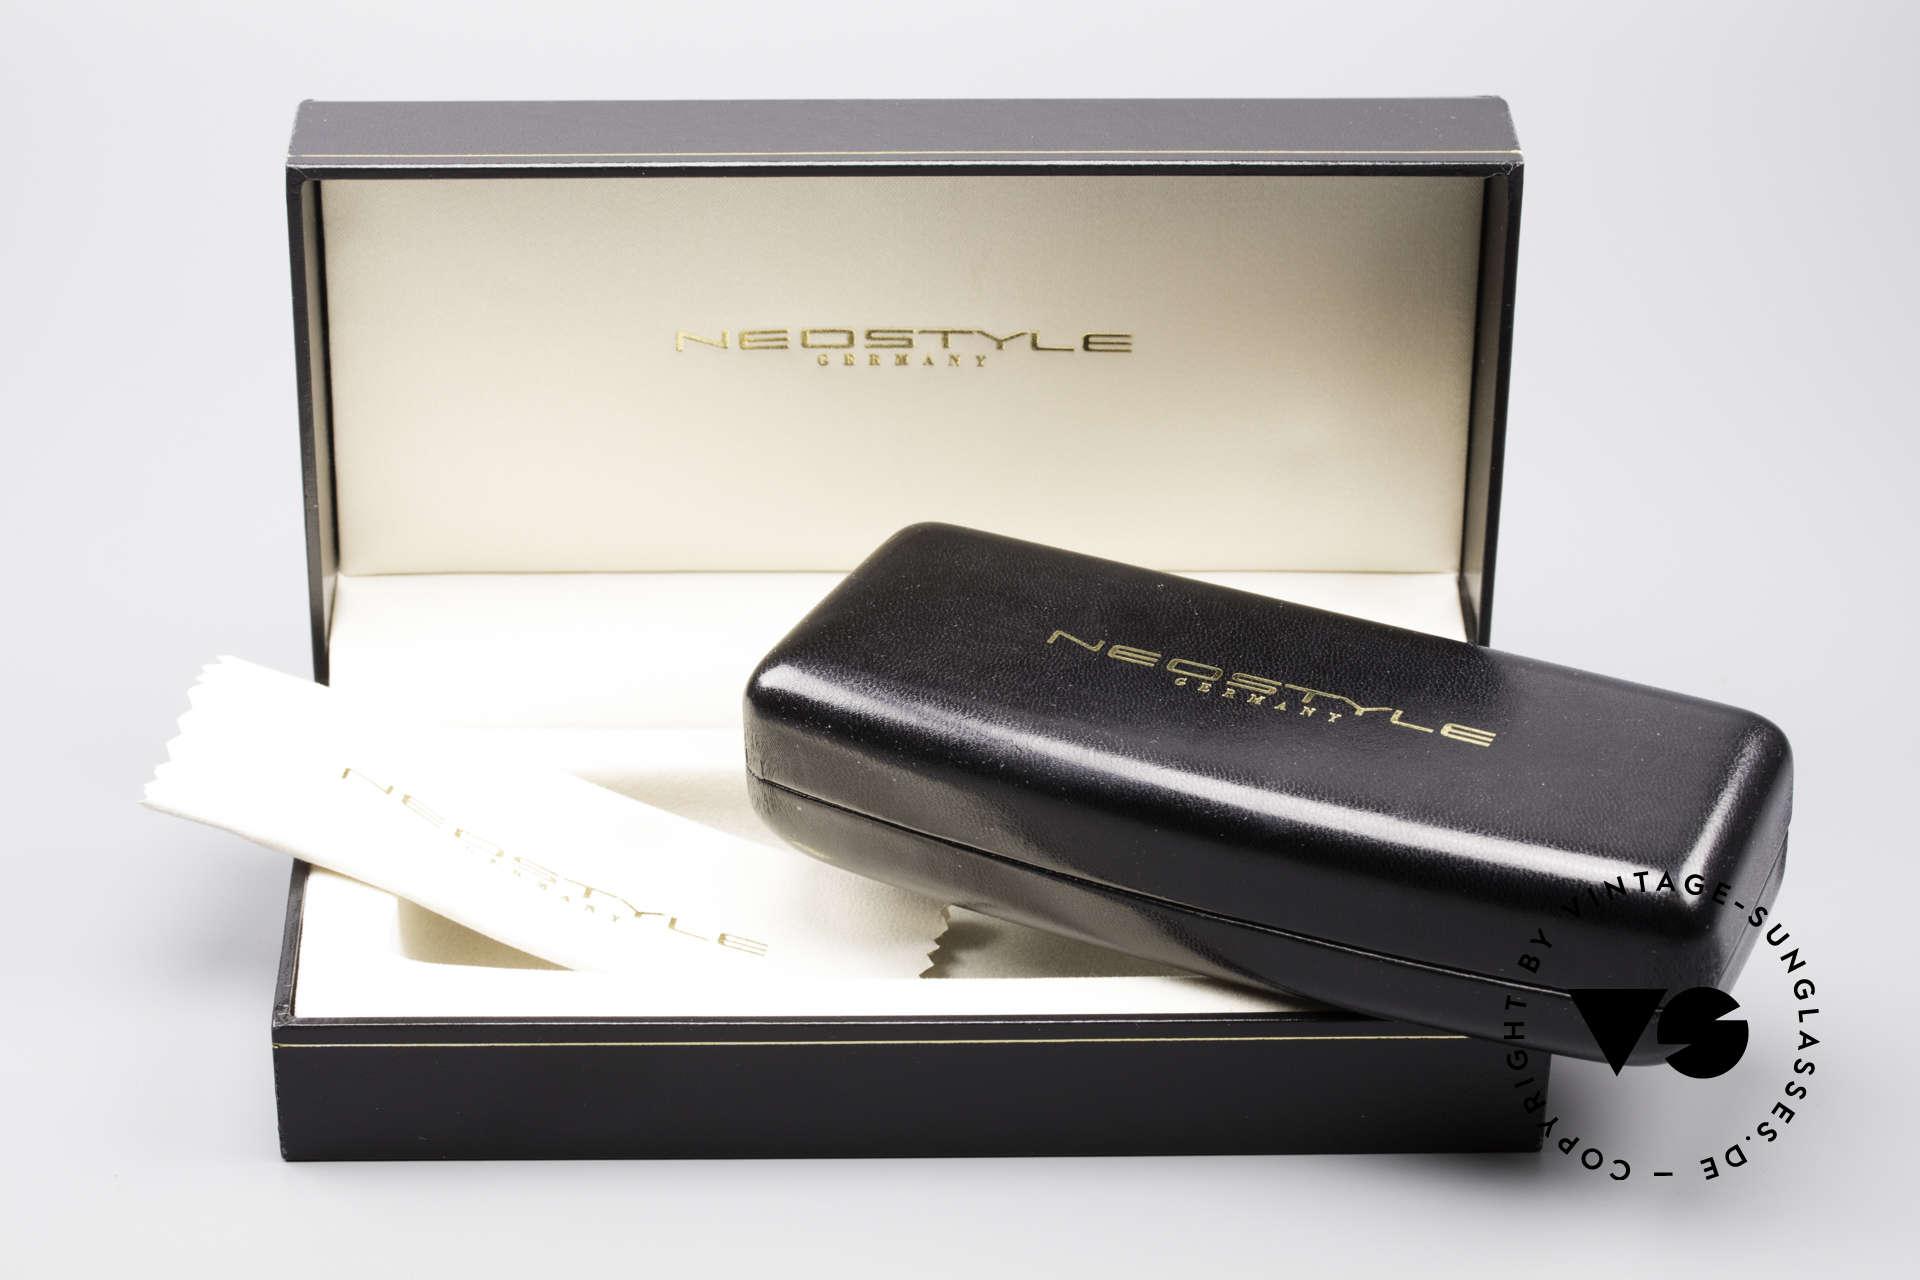 Neostyle Rotary Prestige 33 Titan Frame 80's Eyeglasses, Size: medium, Made for Men